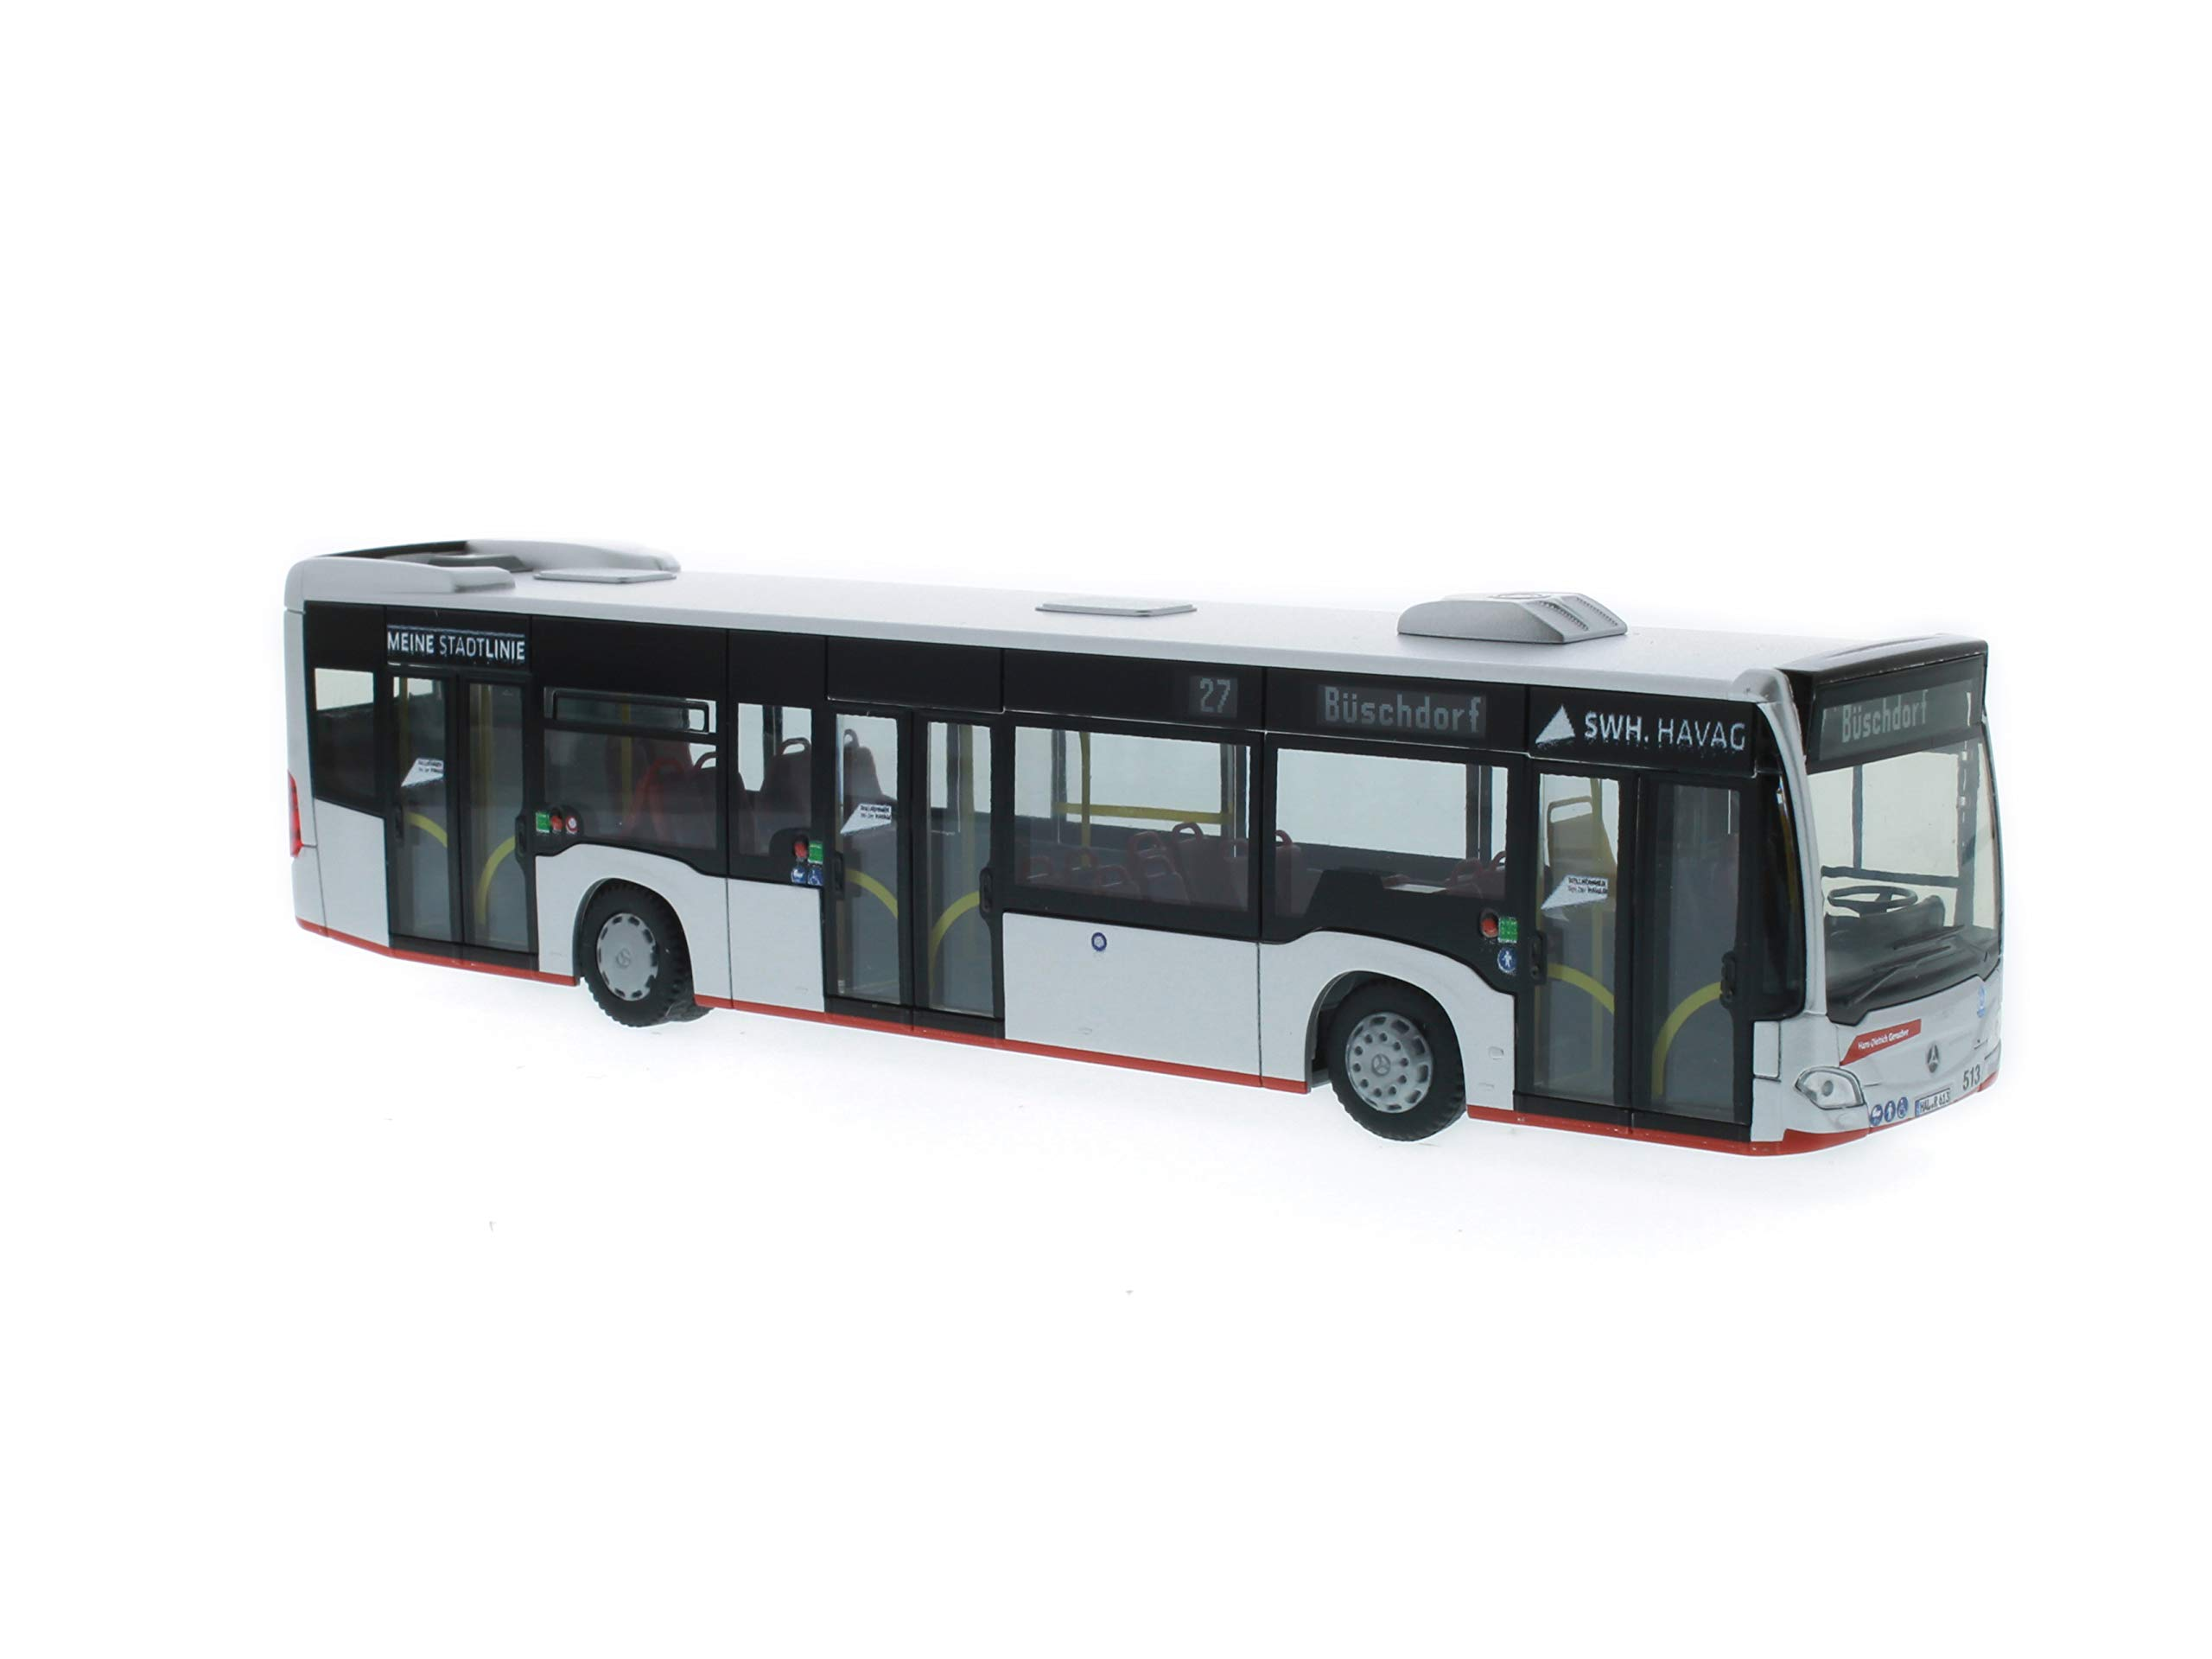 Reitze 73415 Rietze Mercedes-Benz Citaro 15 Havag Genscher Bus Hall Scale 1:87 H0, Multi Colour